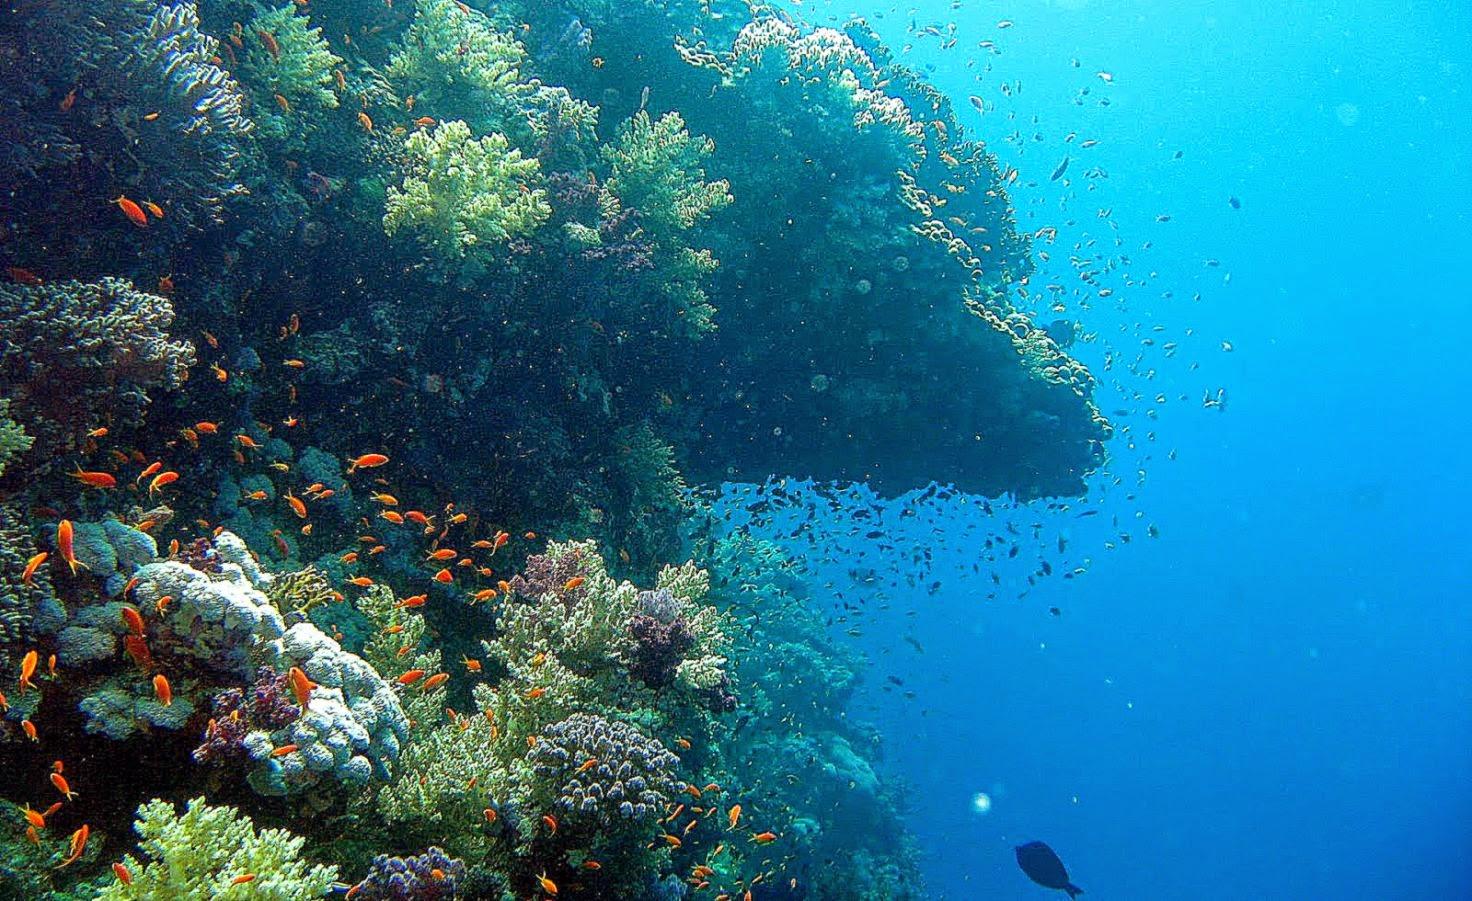 Underwater wallpaper hd - Underwater wallpaper for pc ...